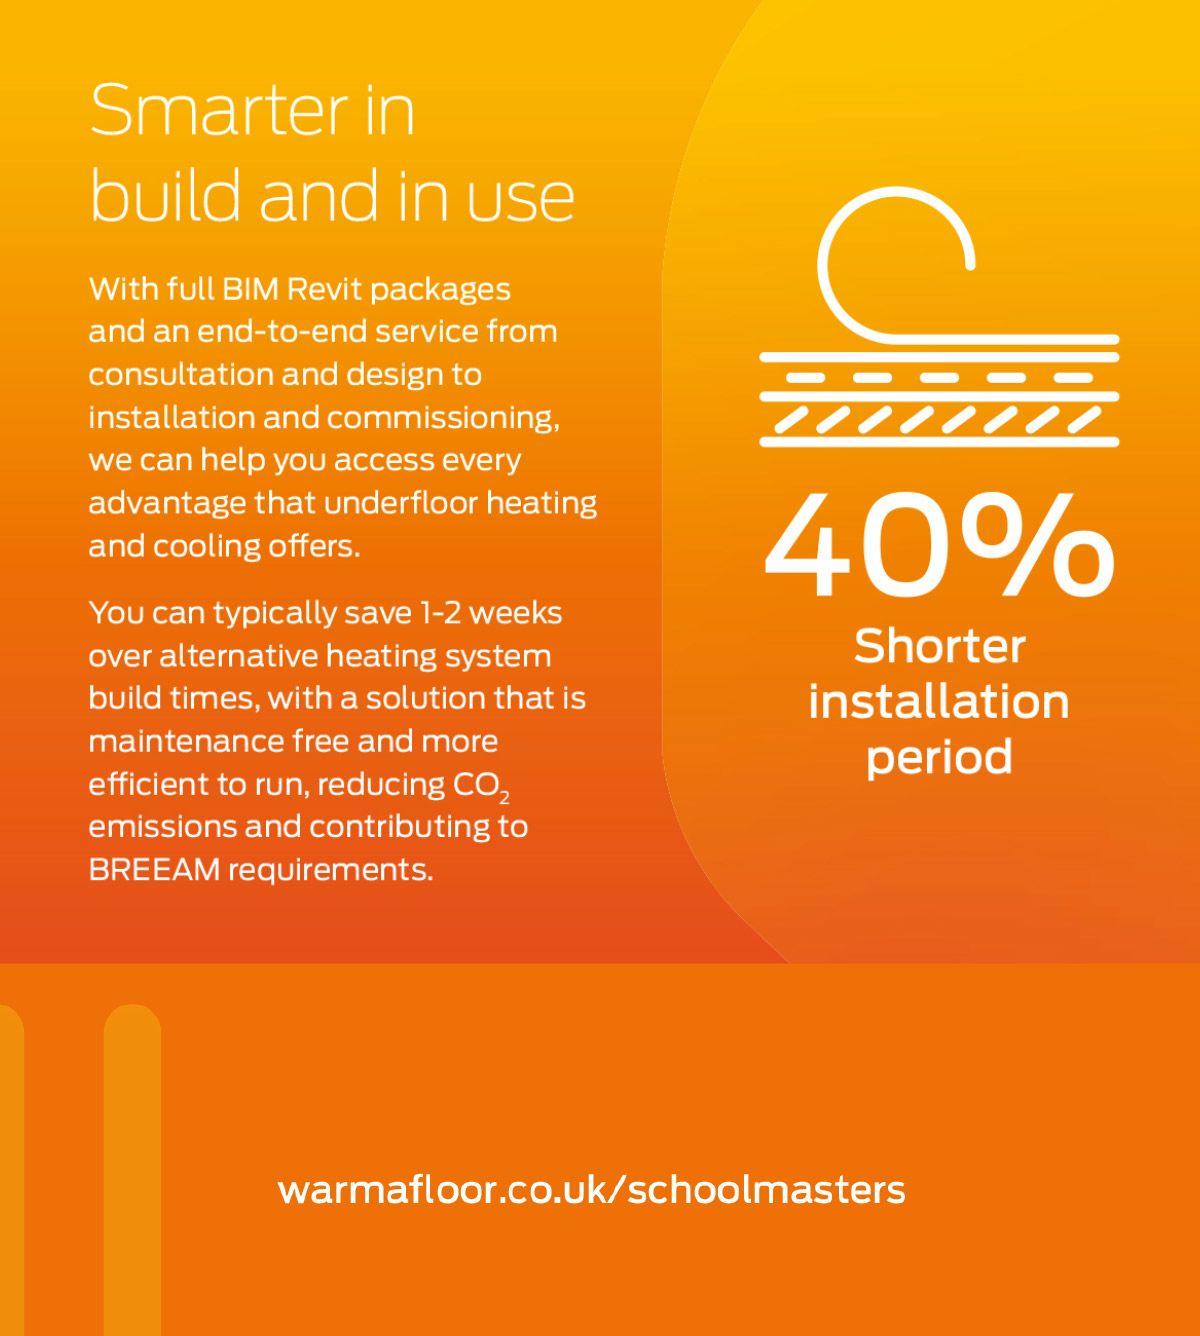 Warmafloor Case Study Image